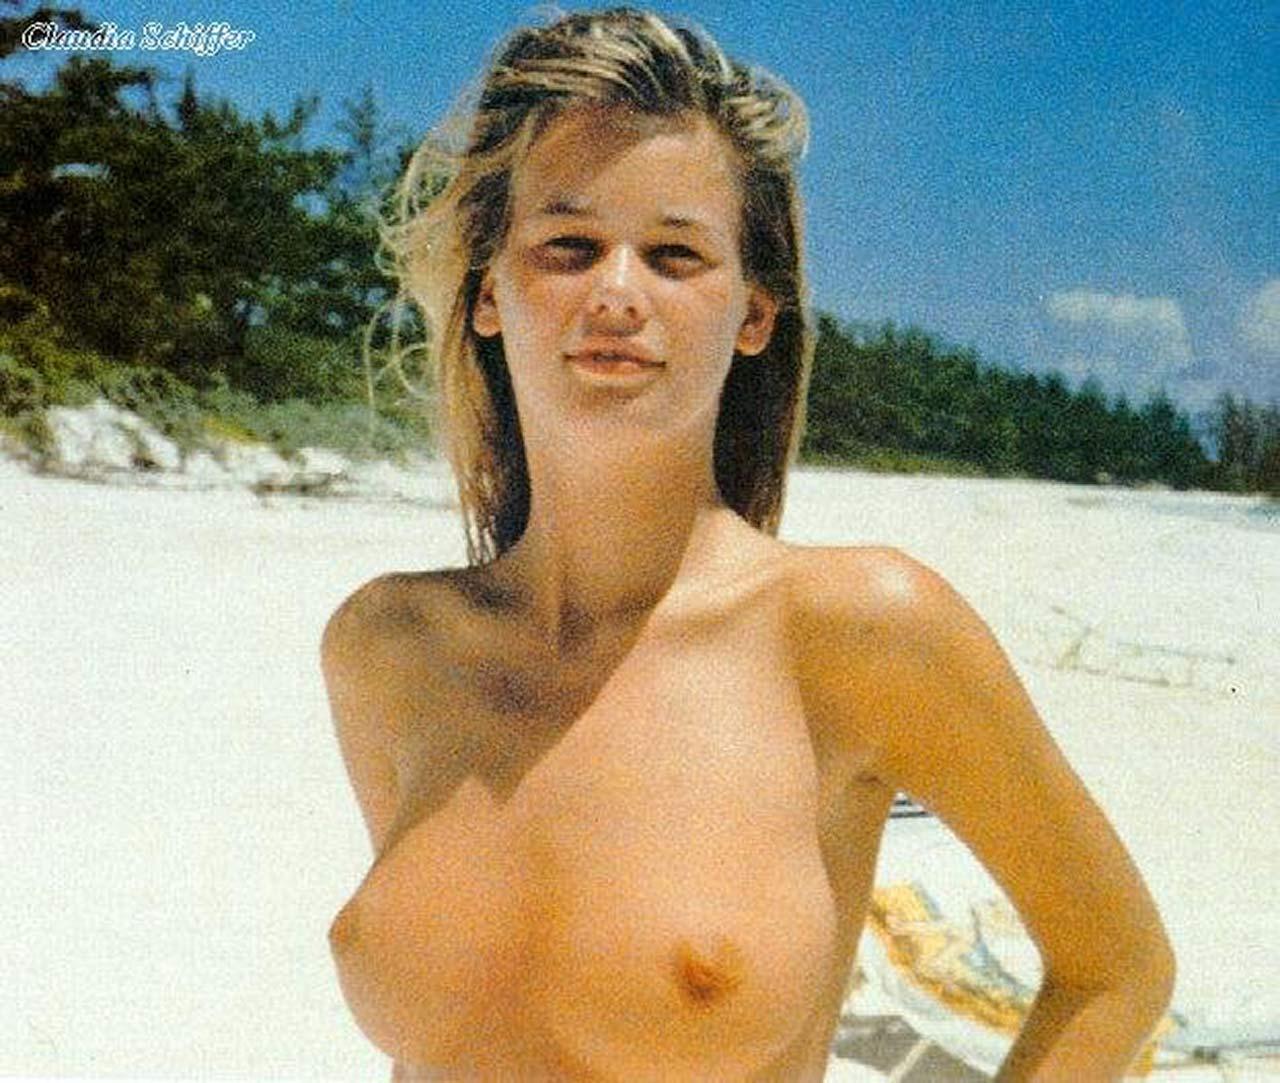 Claudia Schiffer Sex Tape claudia schiffer nude candids and professional pics